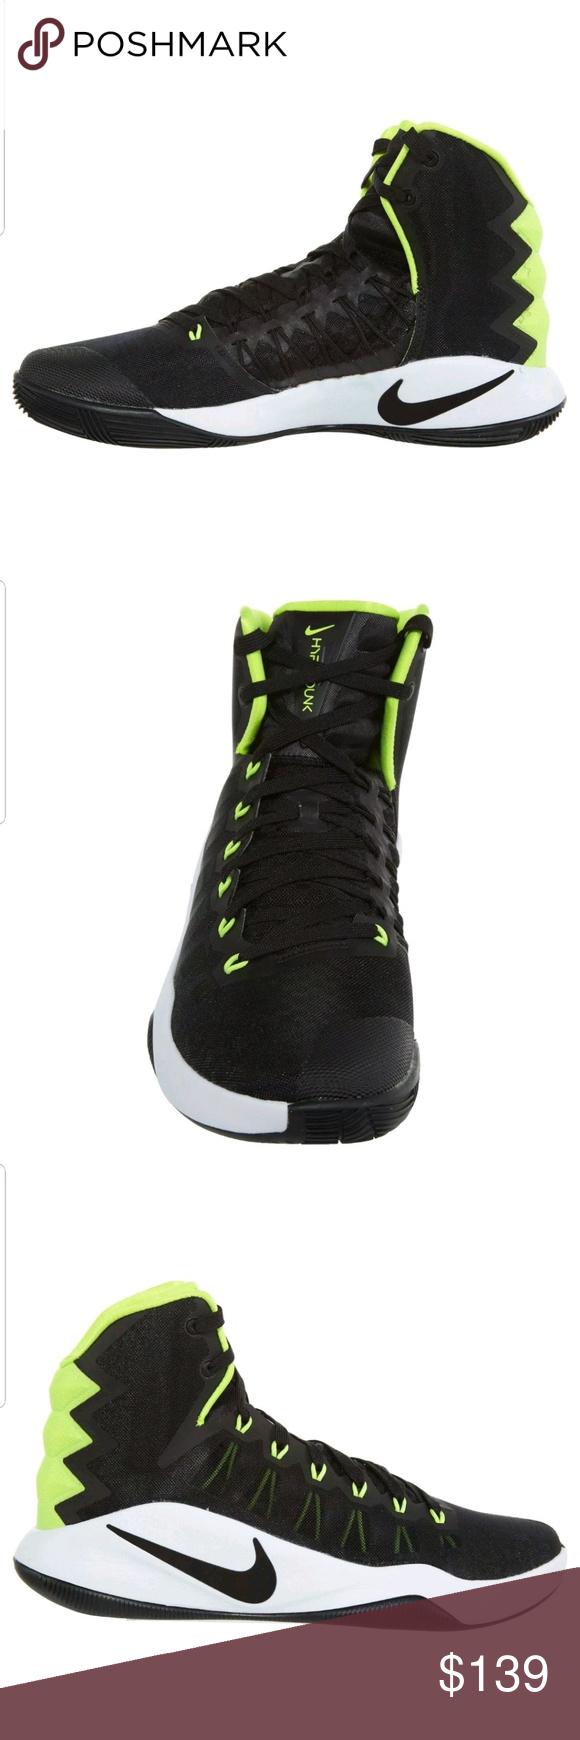 ff187efb442c Nike Hyperdunk 2016 Mens Nike Hyperdunk 2016 Mens 844359-007 Black White  Volt Basketball Shoes Size 10.5 Nike Shoes Athletic Shoes